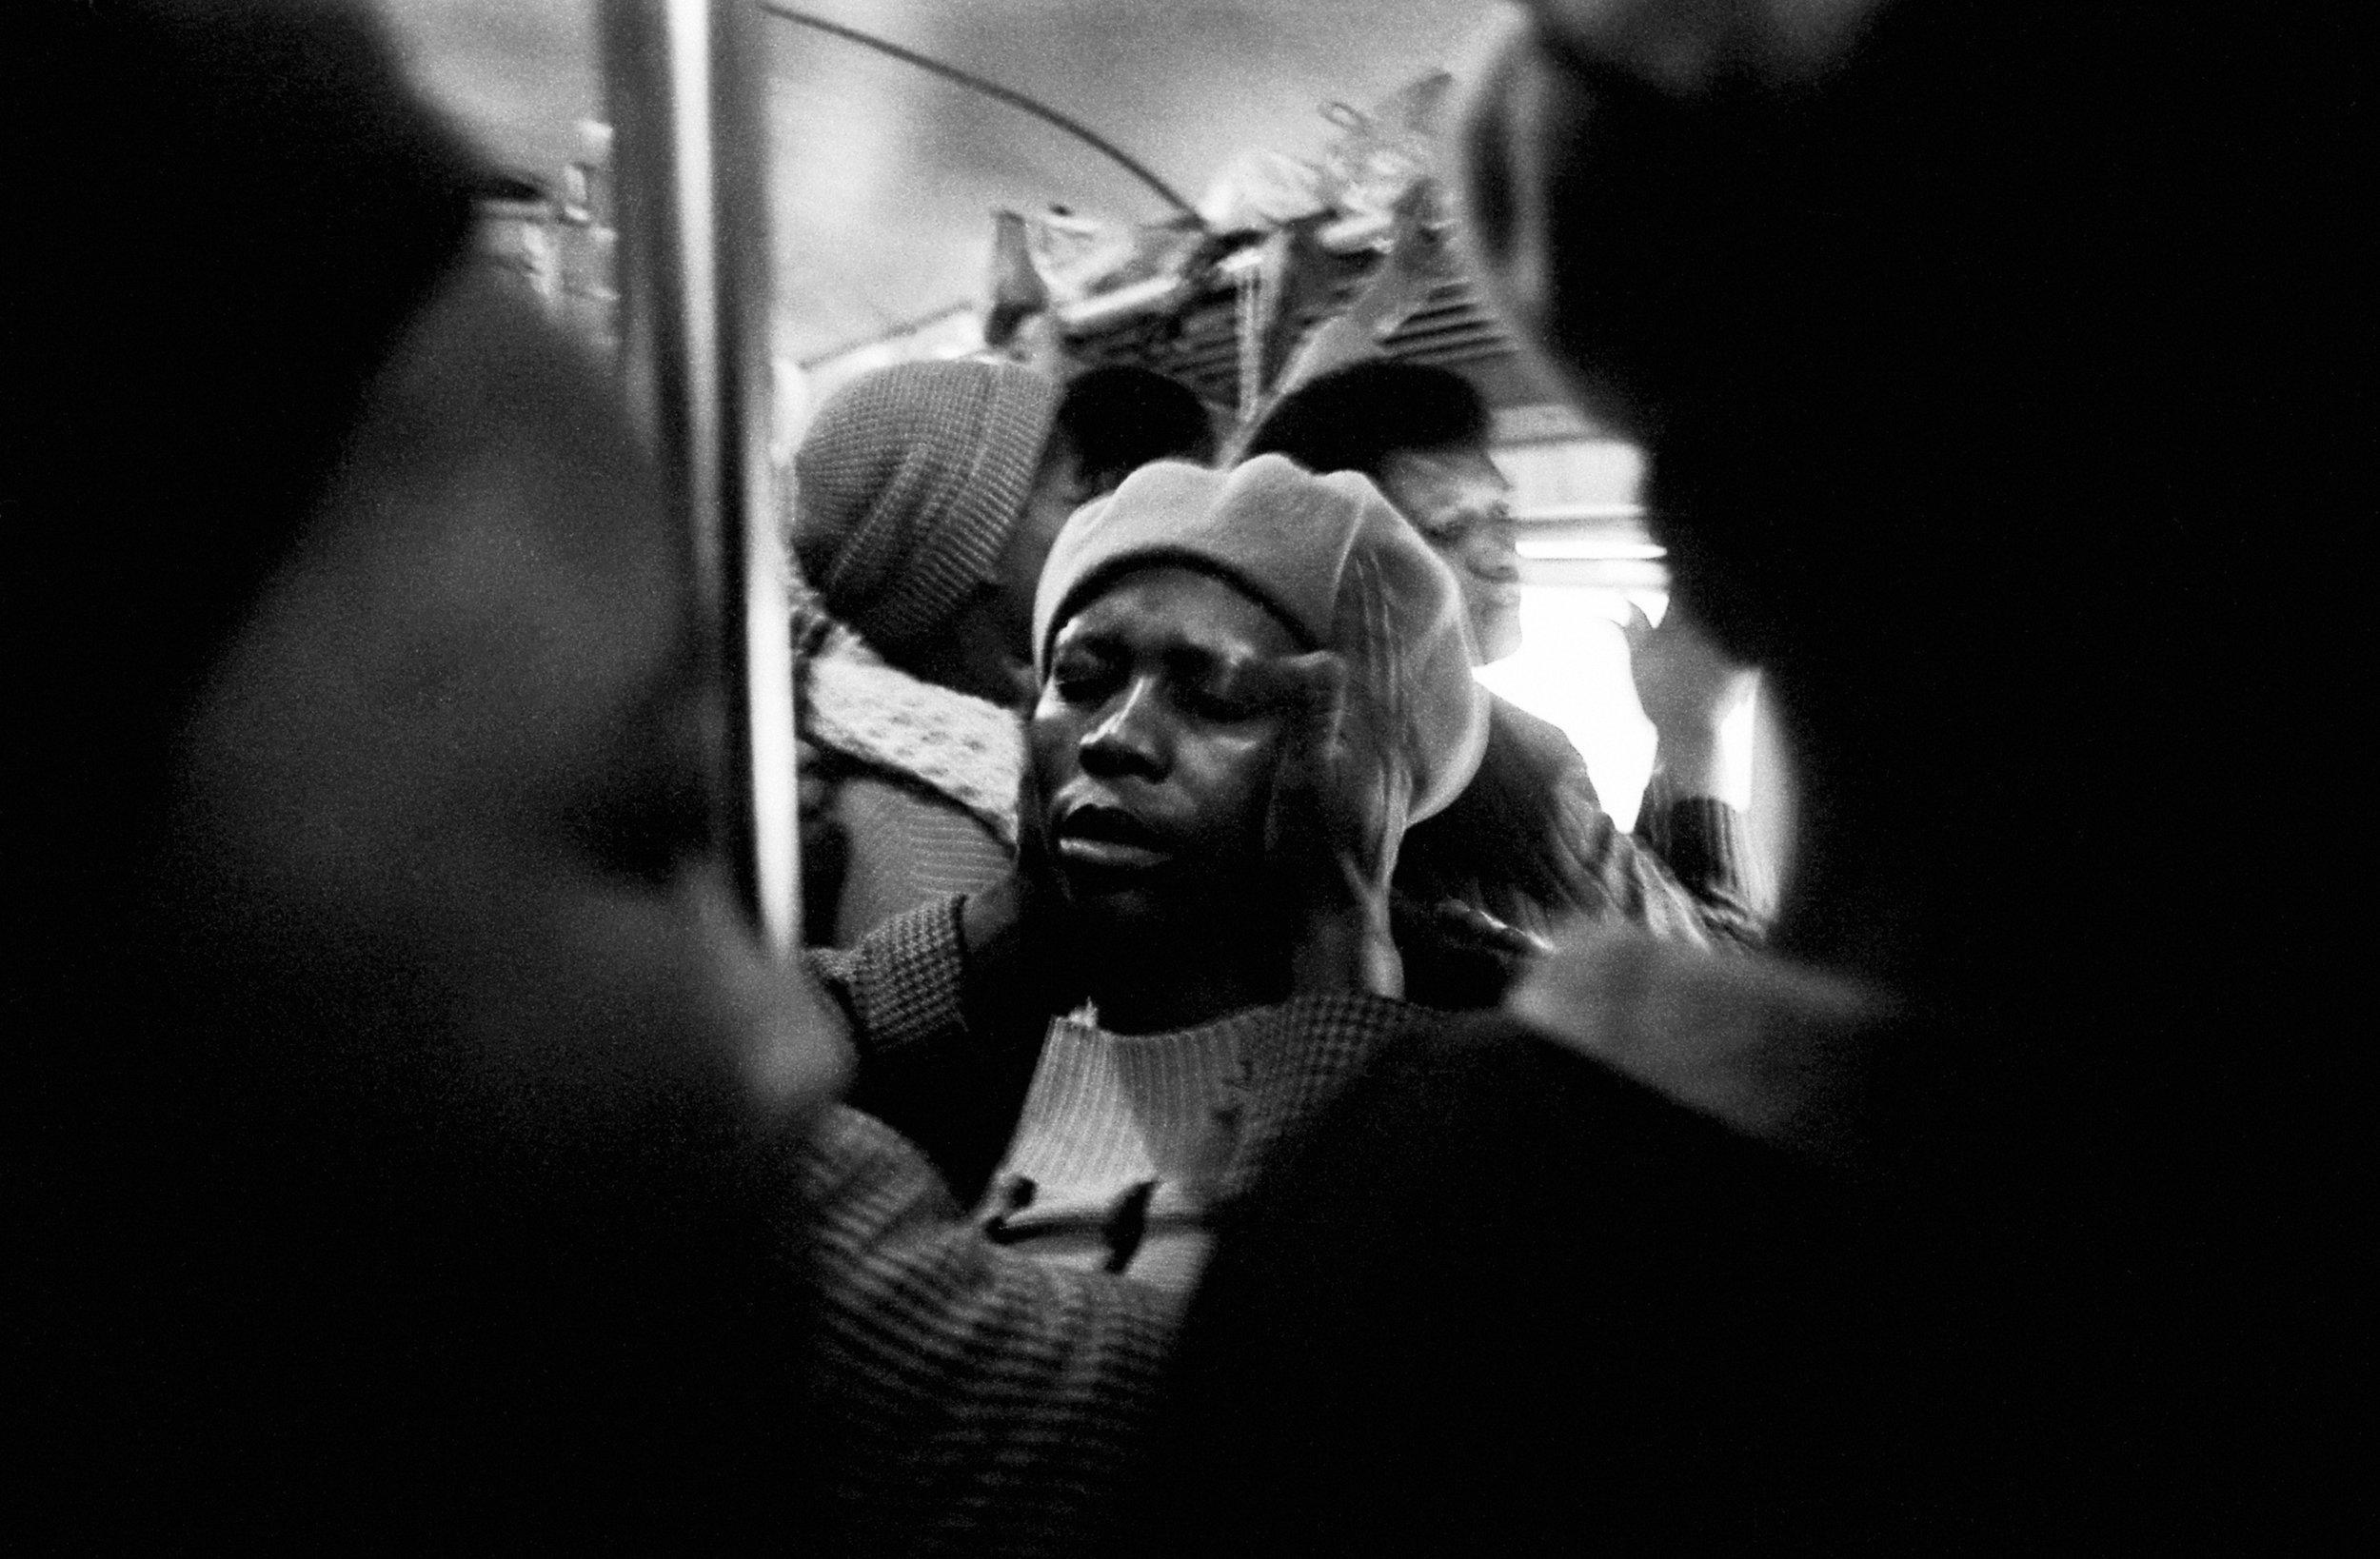 Laying of Hands, Johannesburg-Soweto Line , 1986. Photograph by Santu Mofokeng, ©Santu Mofokeng Foundation. Images courtesy Lunetta Bartz, MAKER, Johannesburg.